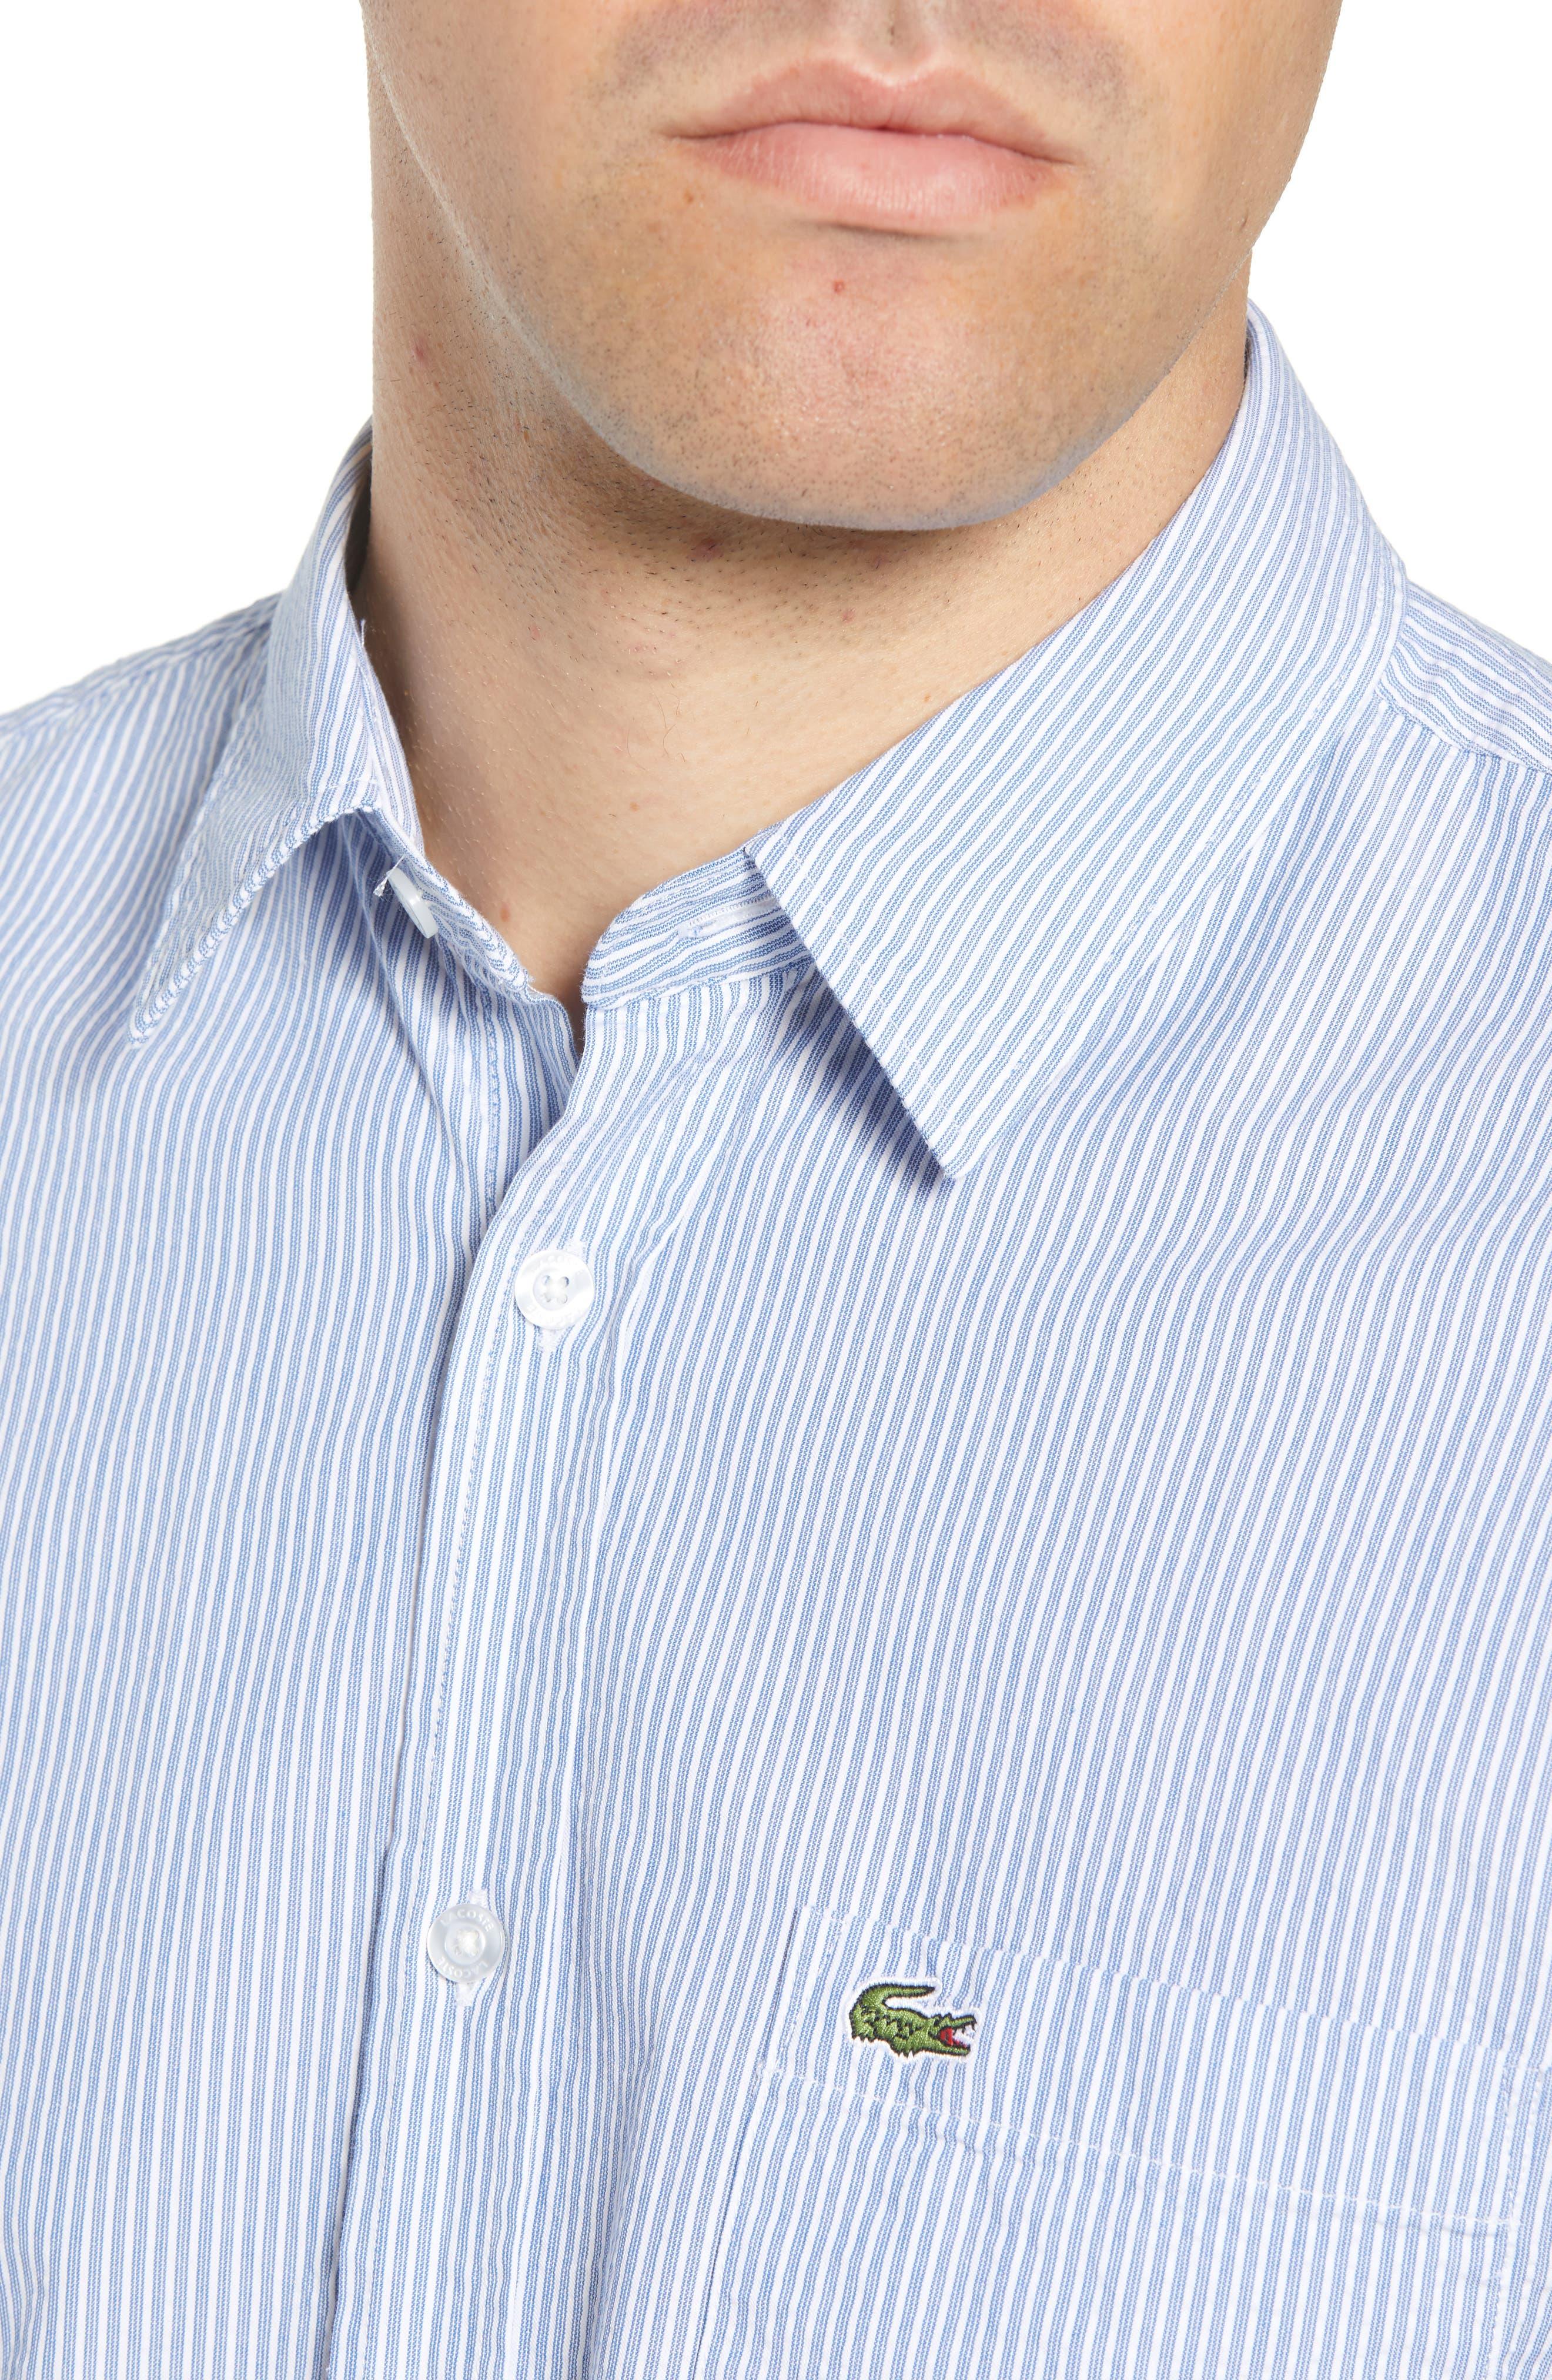 Regular Fit Seersucker Sport Shirt,                             Alternate thumbnail 4, color,                             400